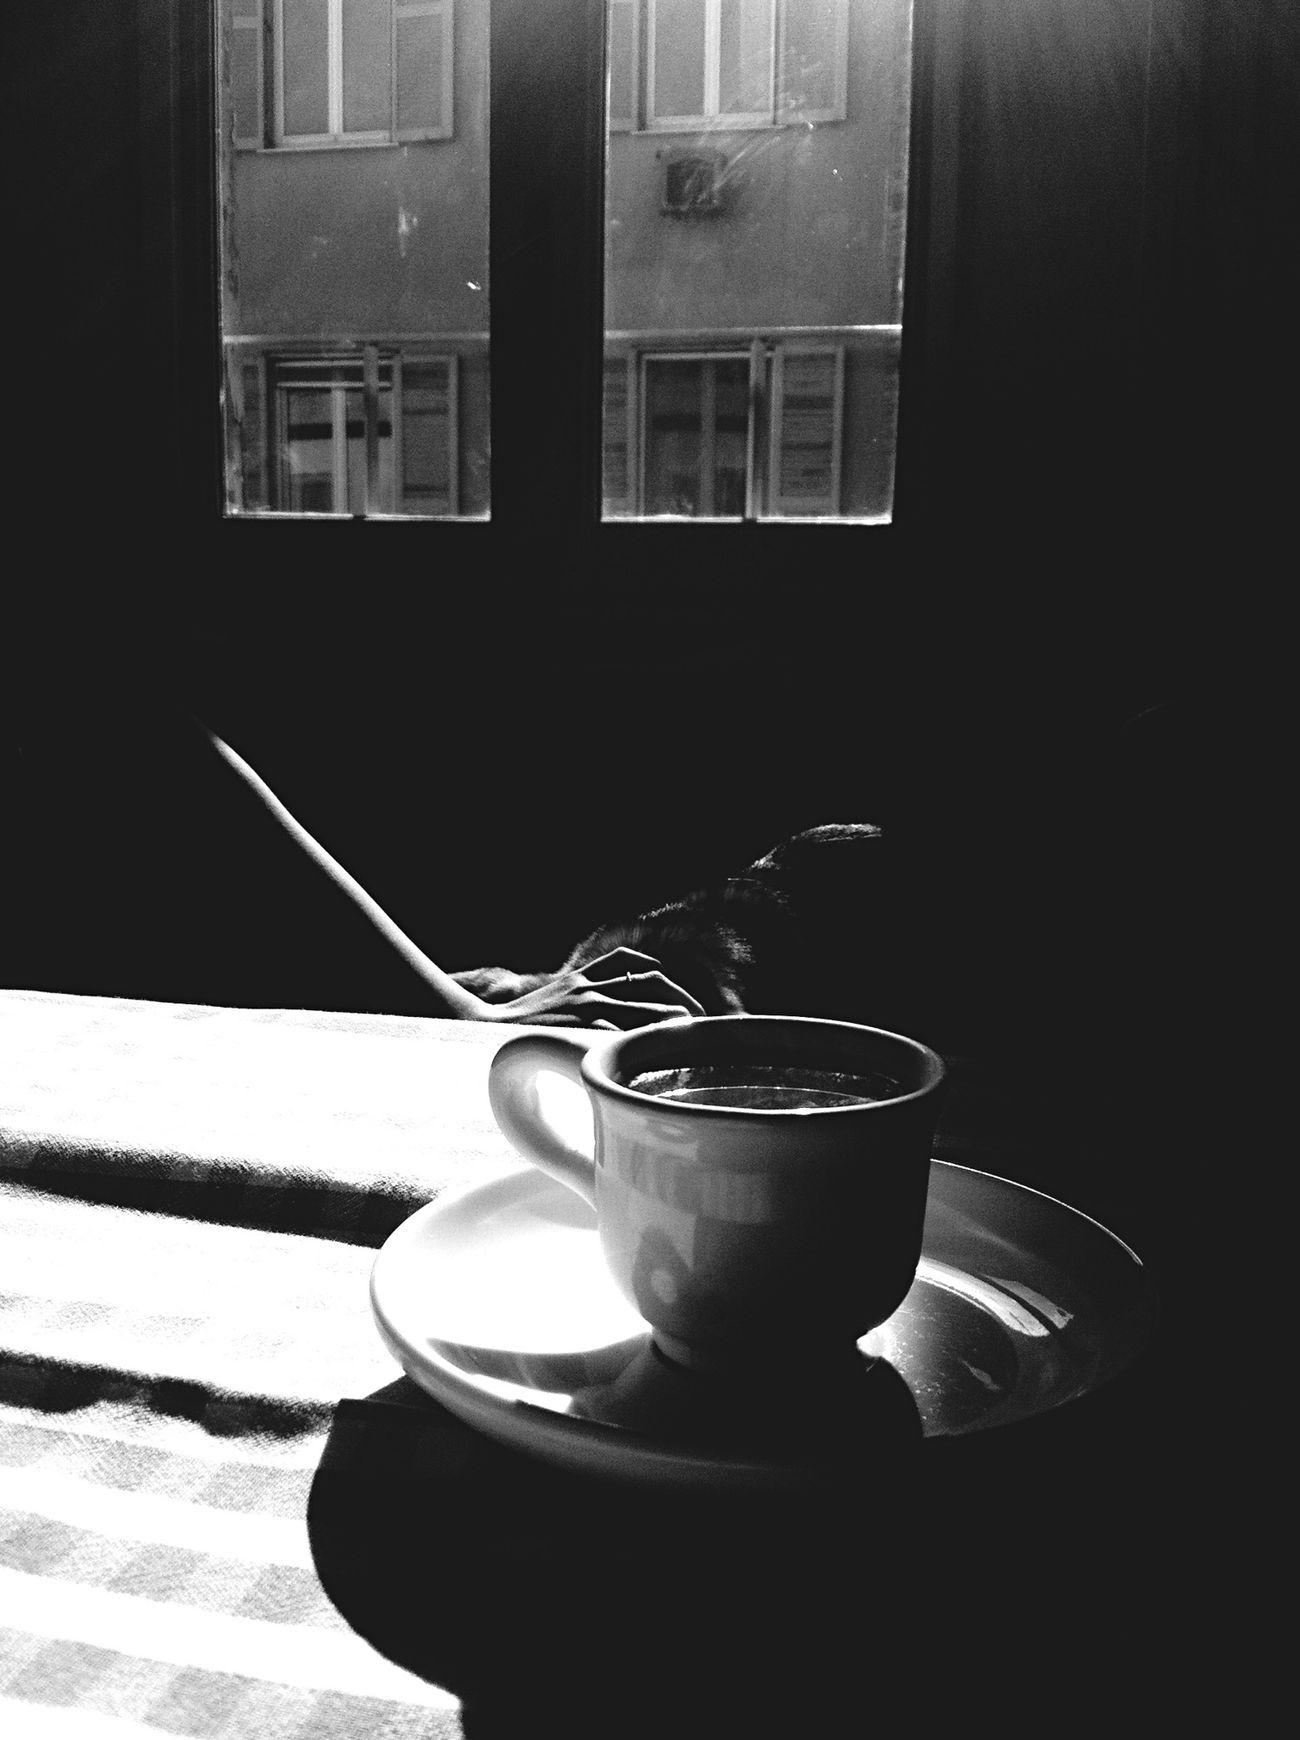 Goodmorning Coffee Breakfast EyeEm Best Shots EyeEm Best Shots - Black + White Blackandwhite Home Sweet Home Nothing Better